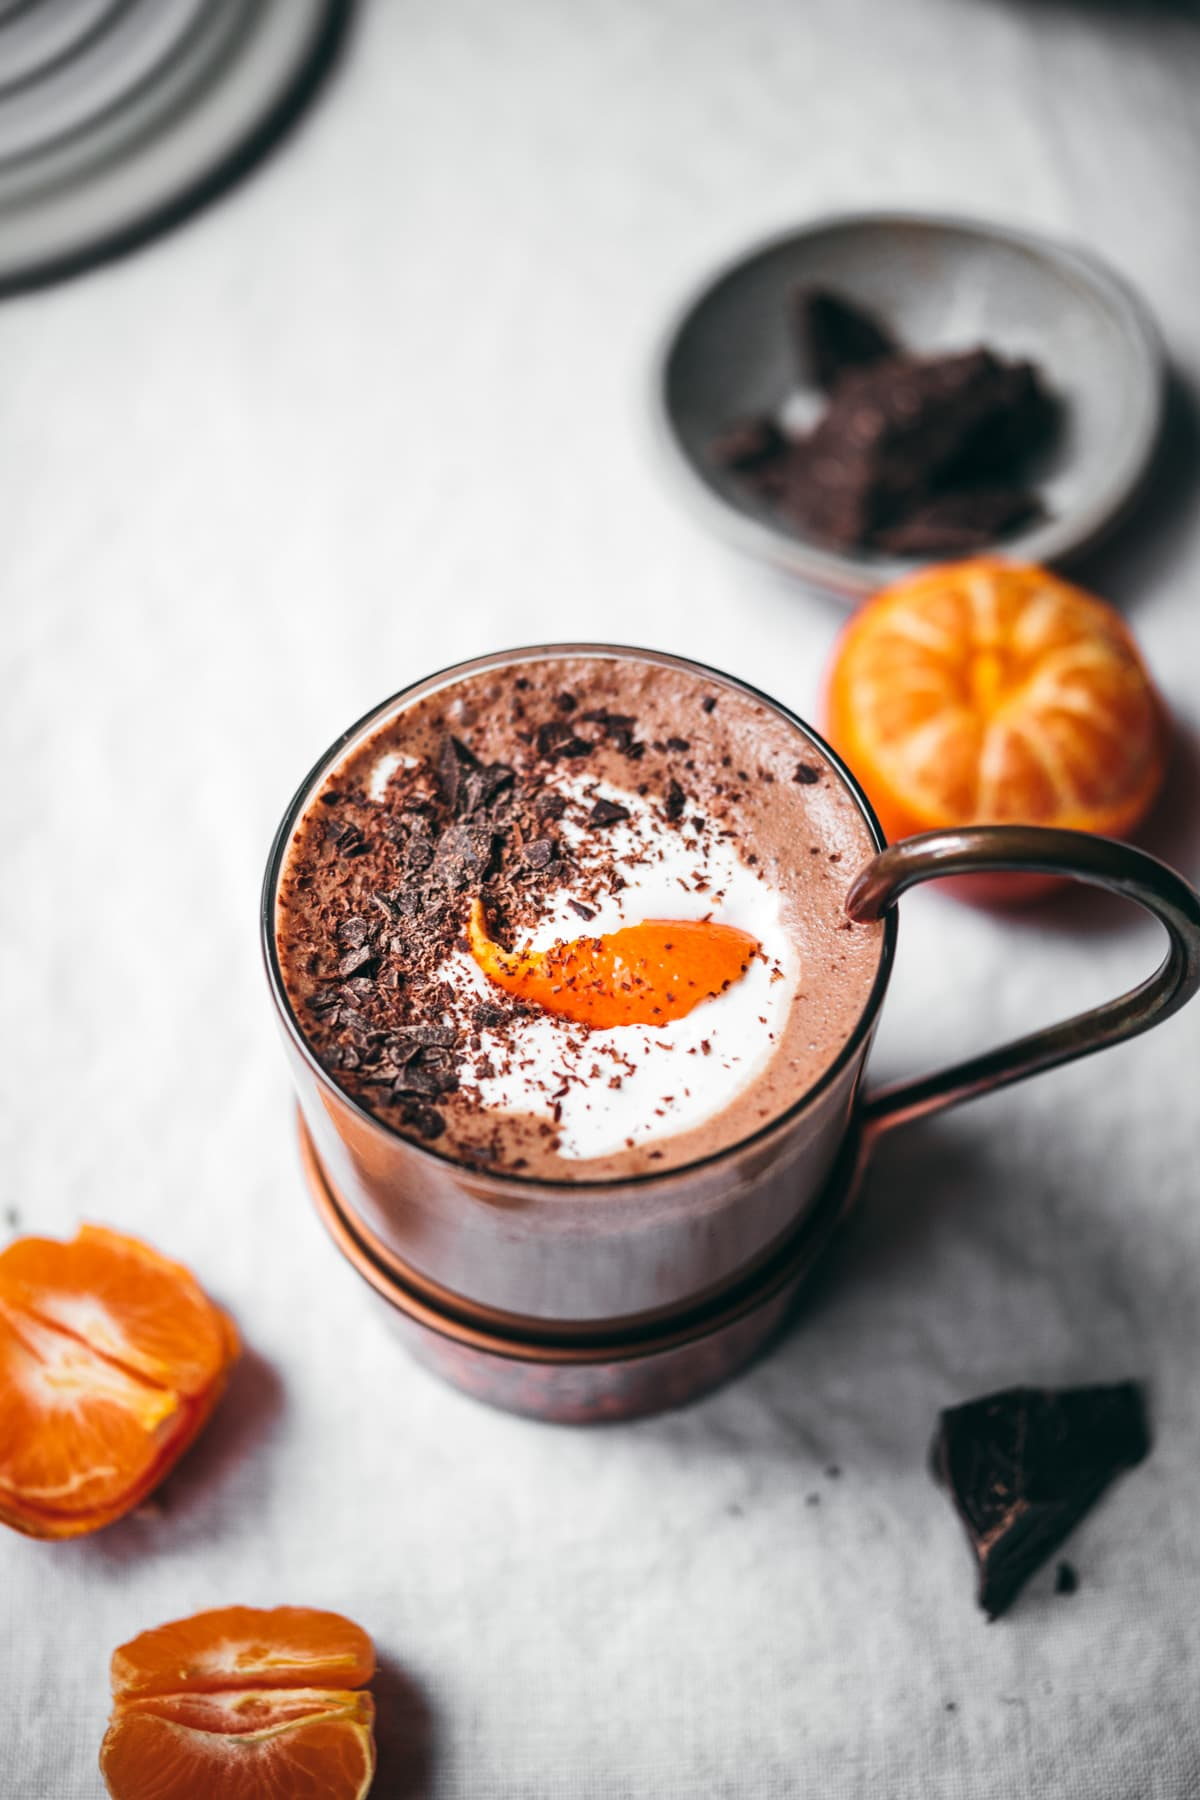 close up view of vegan bourbon orange hot chocolate topped with chocolate shavings and orange peel.